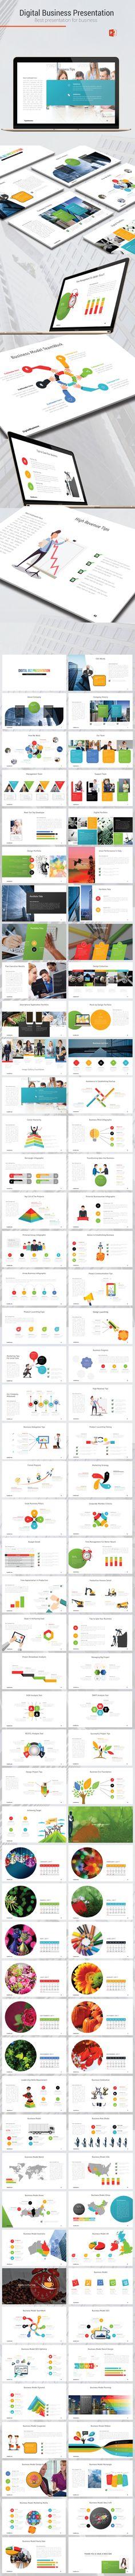 Digital Business PowerPoint Presentation Template